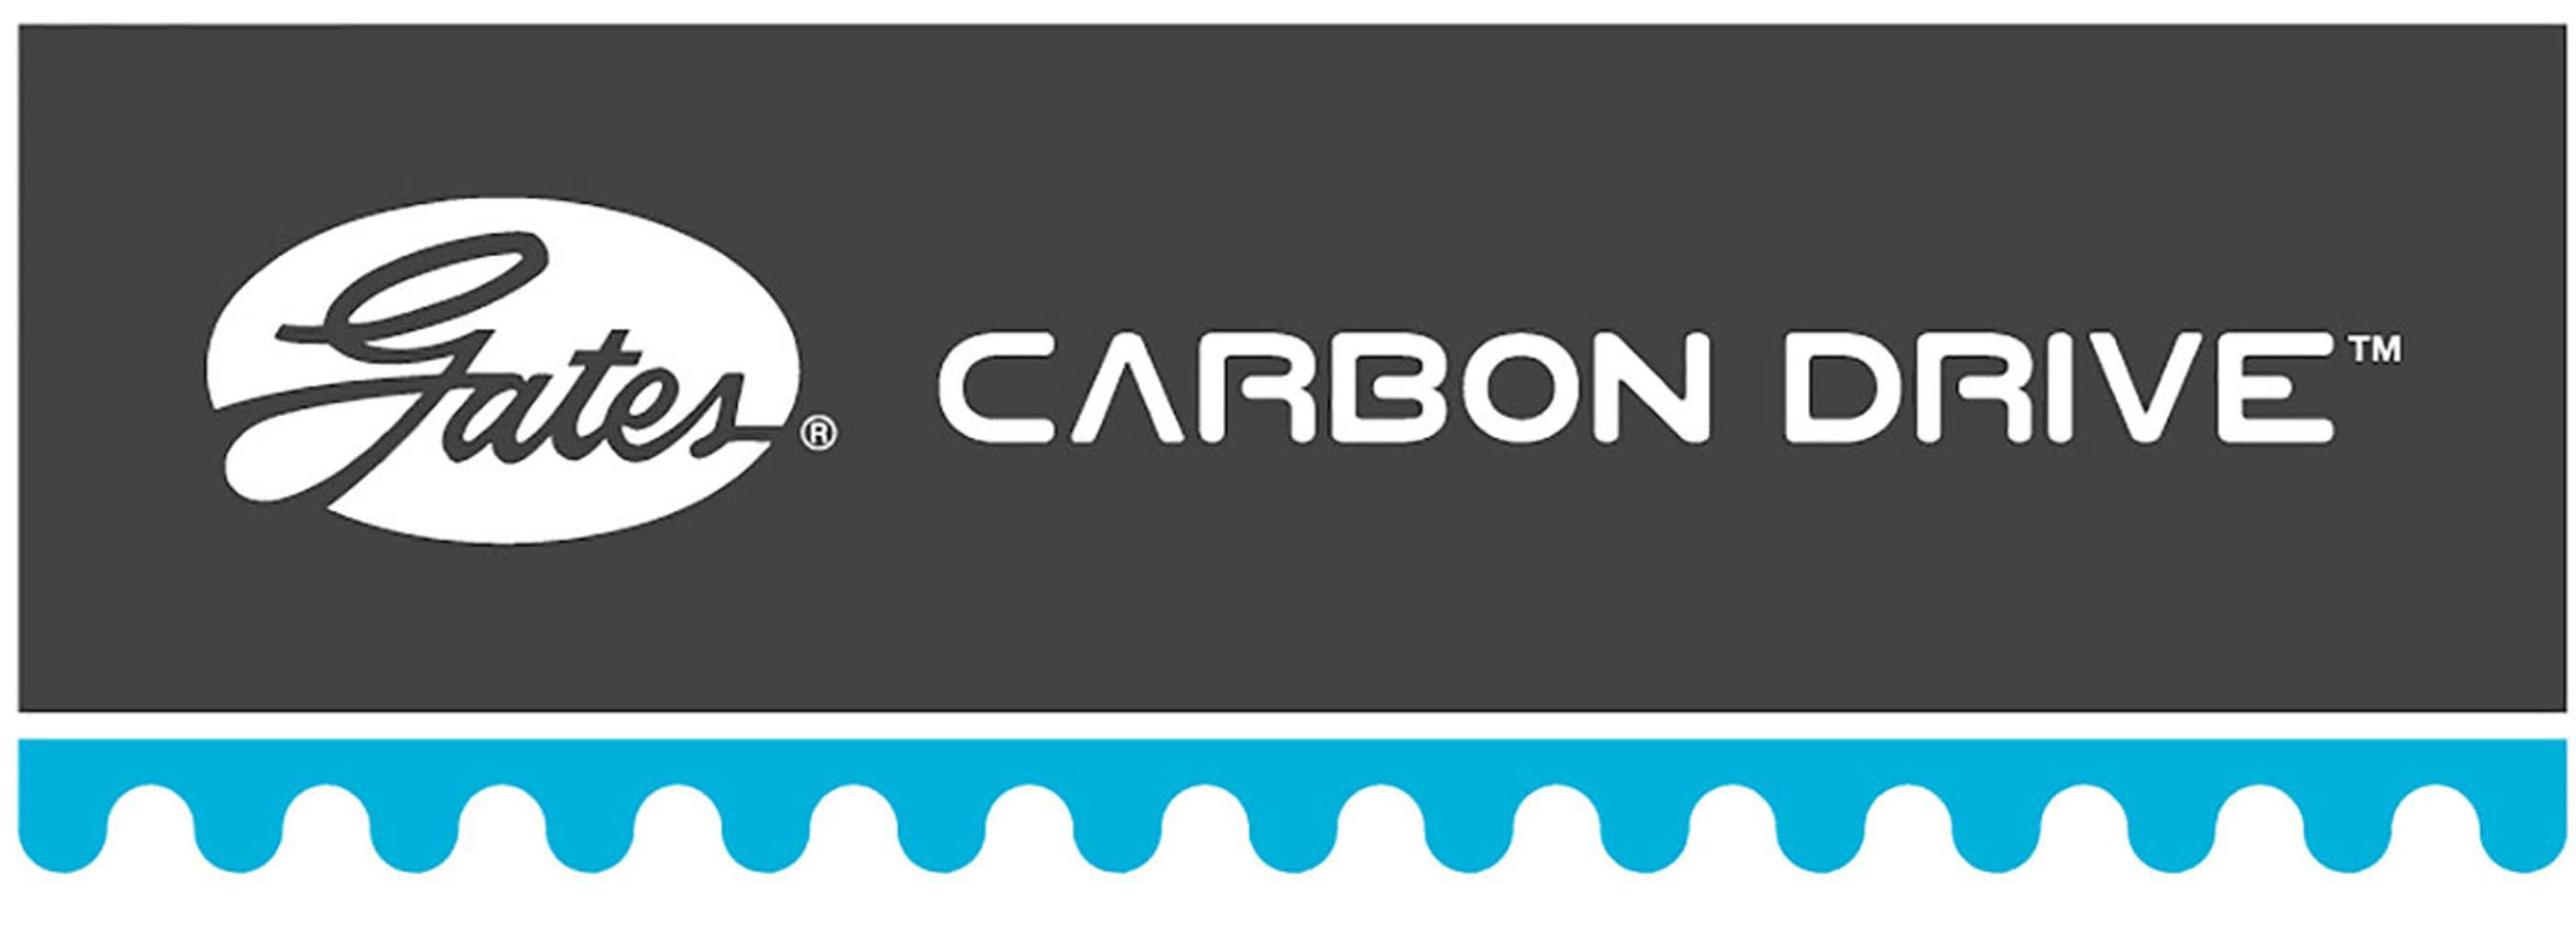 Gates Carbon Drive. (PRNewsFoto/Gates Corporation)